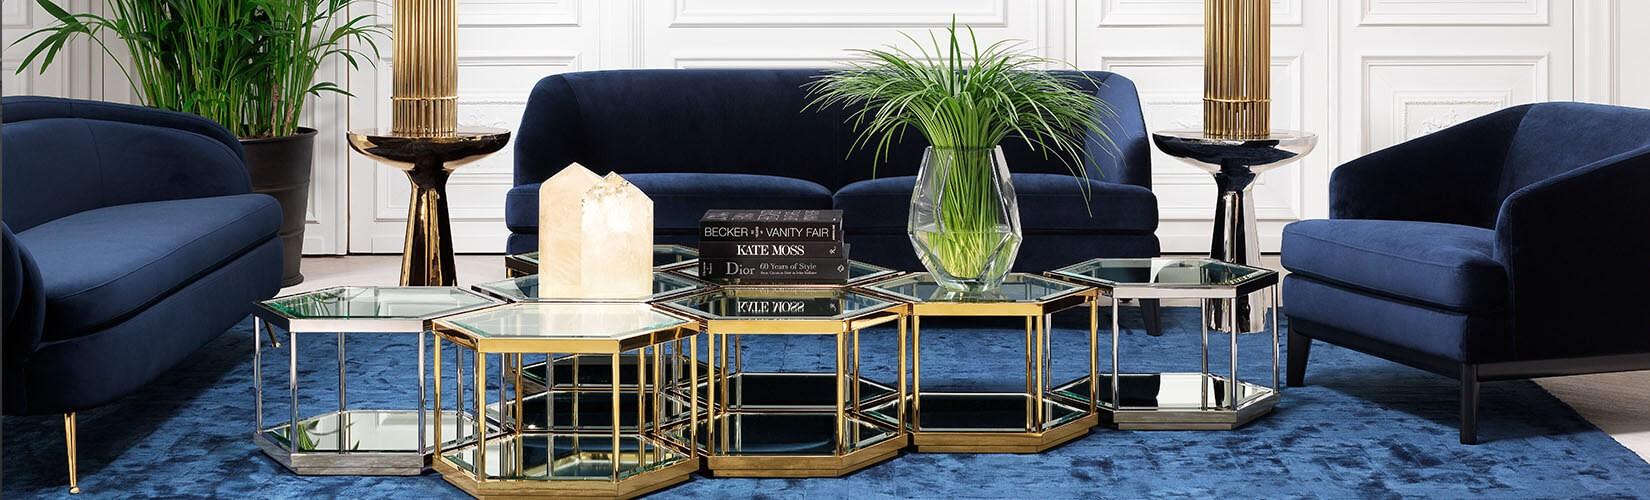 Top Home Interior Design Trends 2018